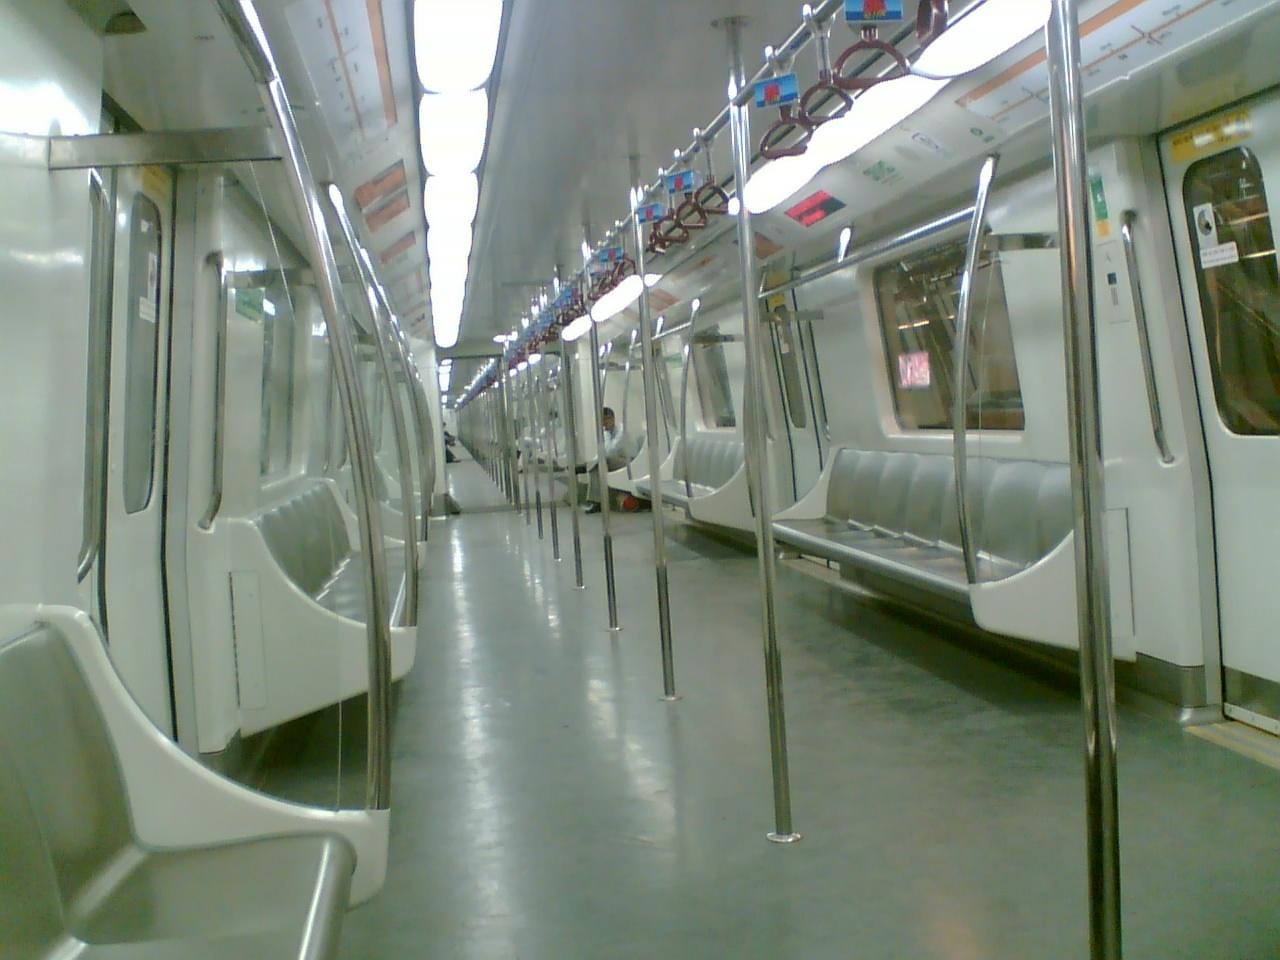 empty trains